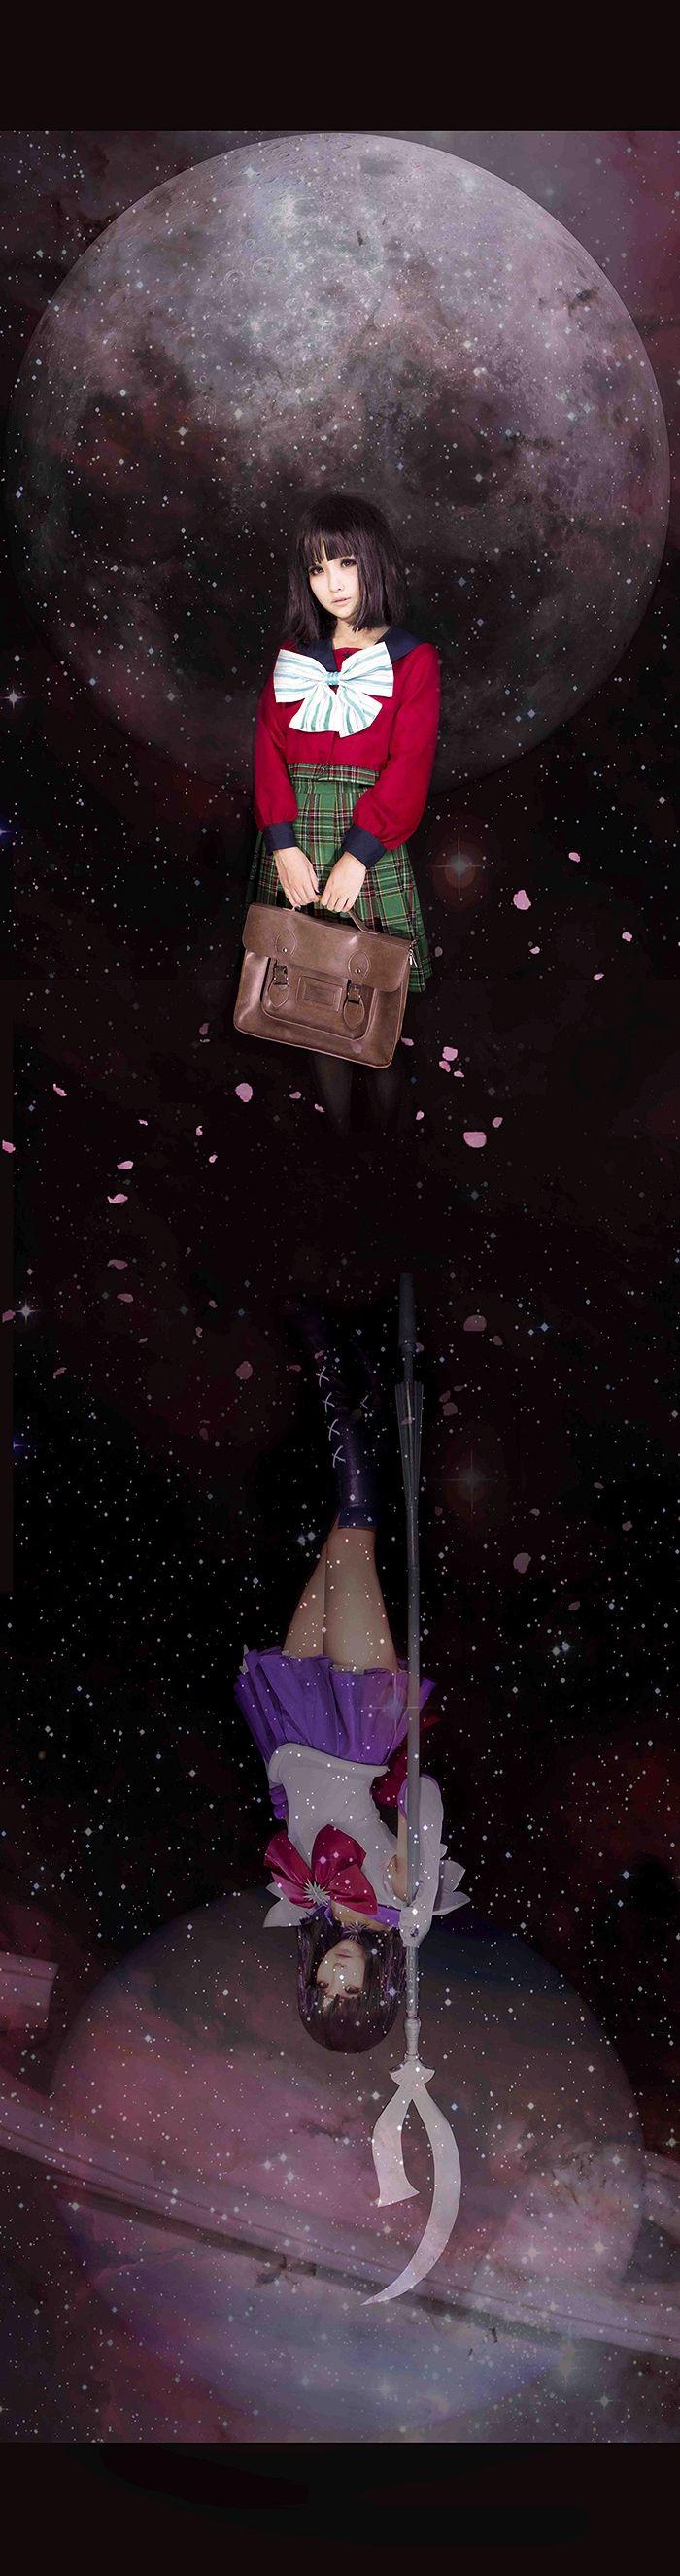 Hotaru Tomoe aka Sailor Saturn From: Sailor Moon Cosplayer: Yizumi Photographer/PShop: Unknown Source: en.CureCosplay.com